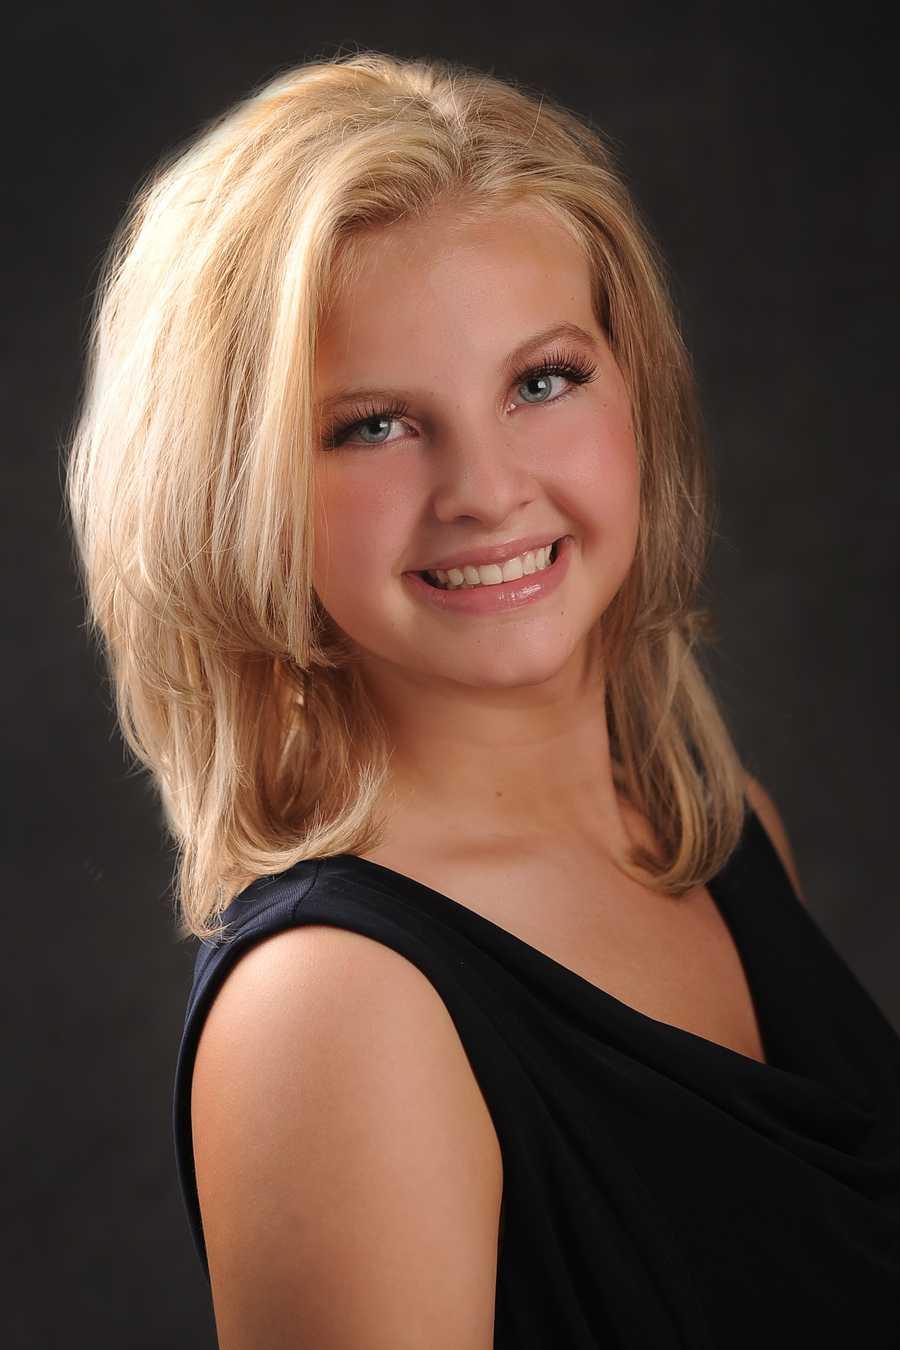 Skye Robison, Miss Southeastern NM